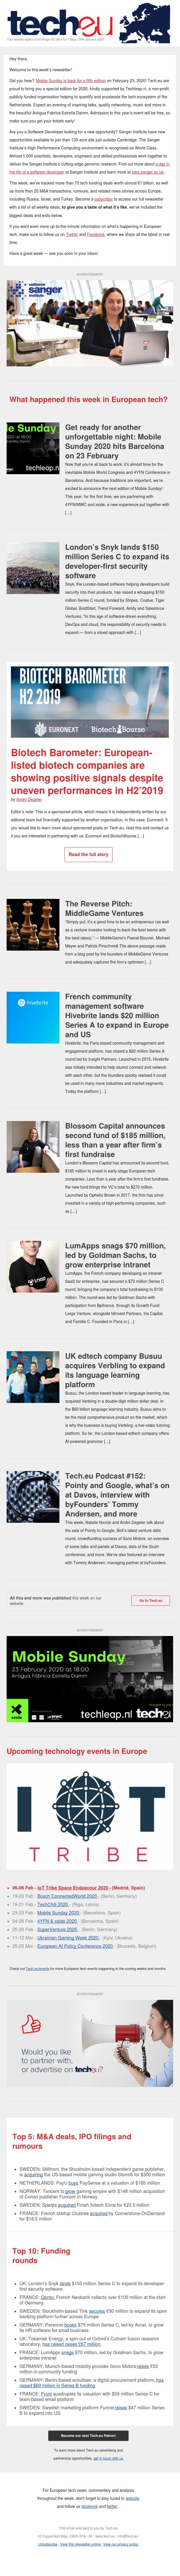 Tech.eu Newsletter #321: Snyk raises $150 million, France changes stock option rules, Blossom Capital announces $185 million fund, and more